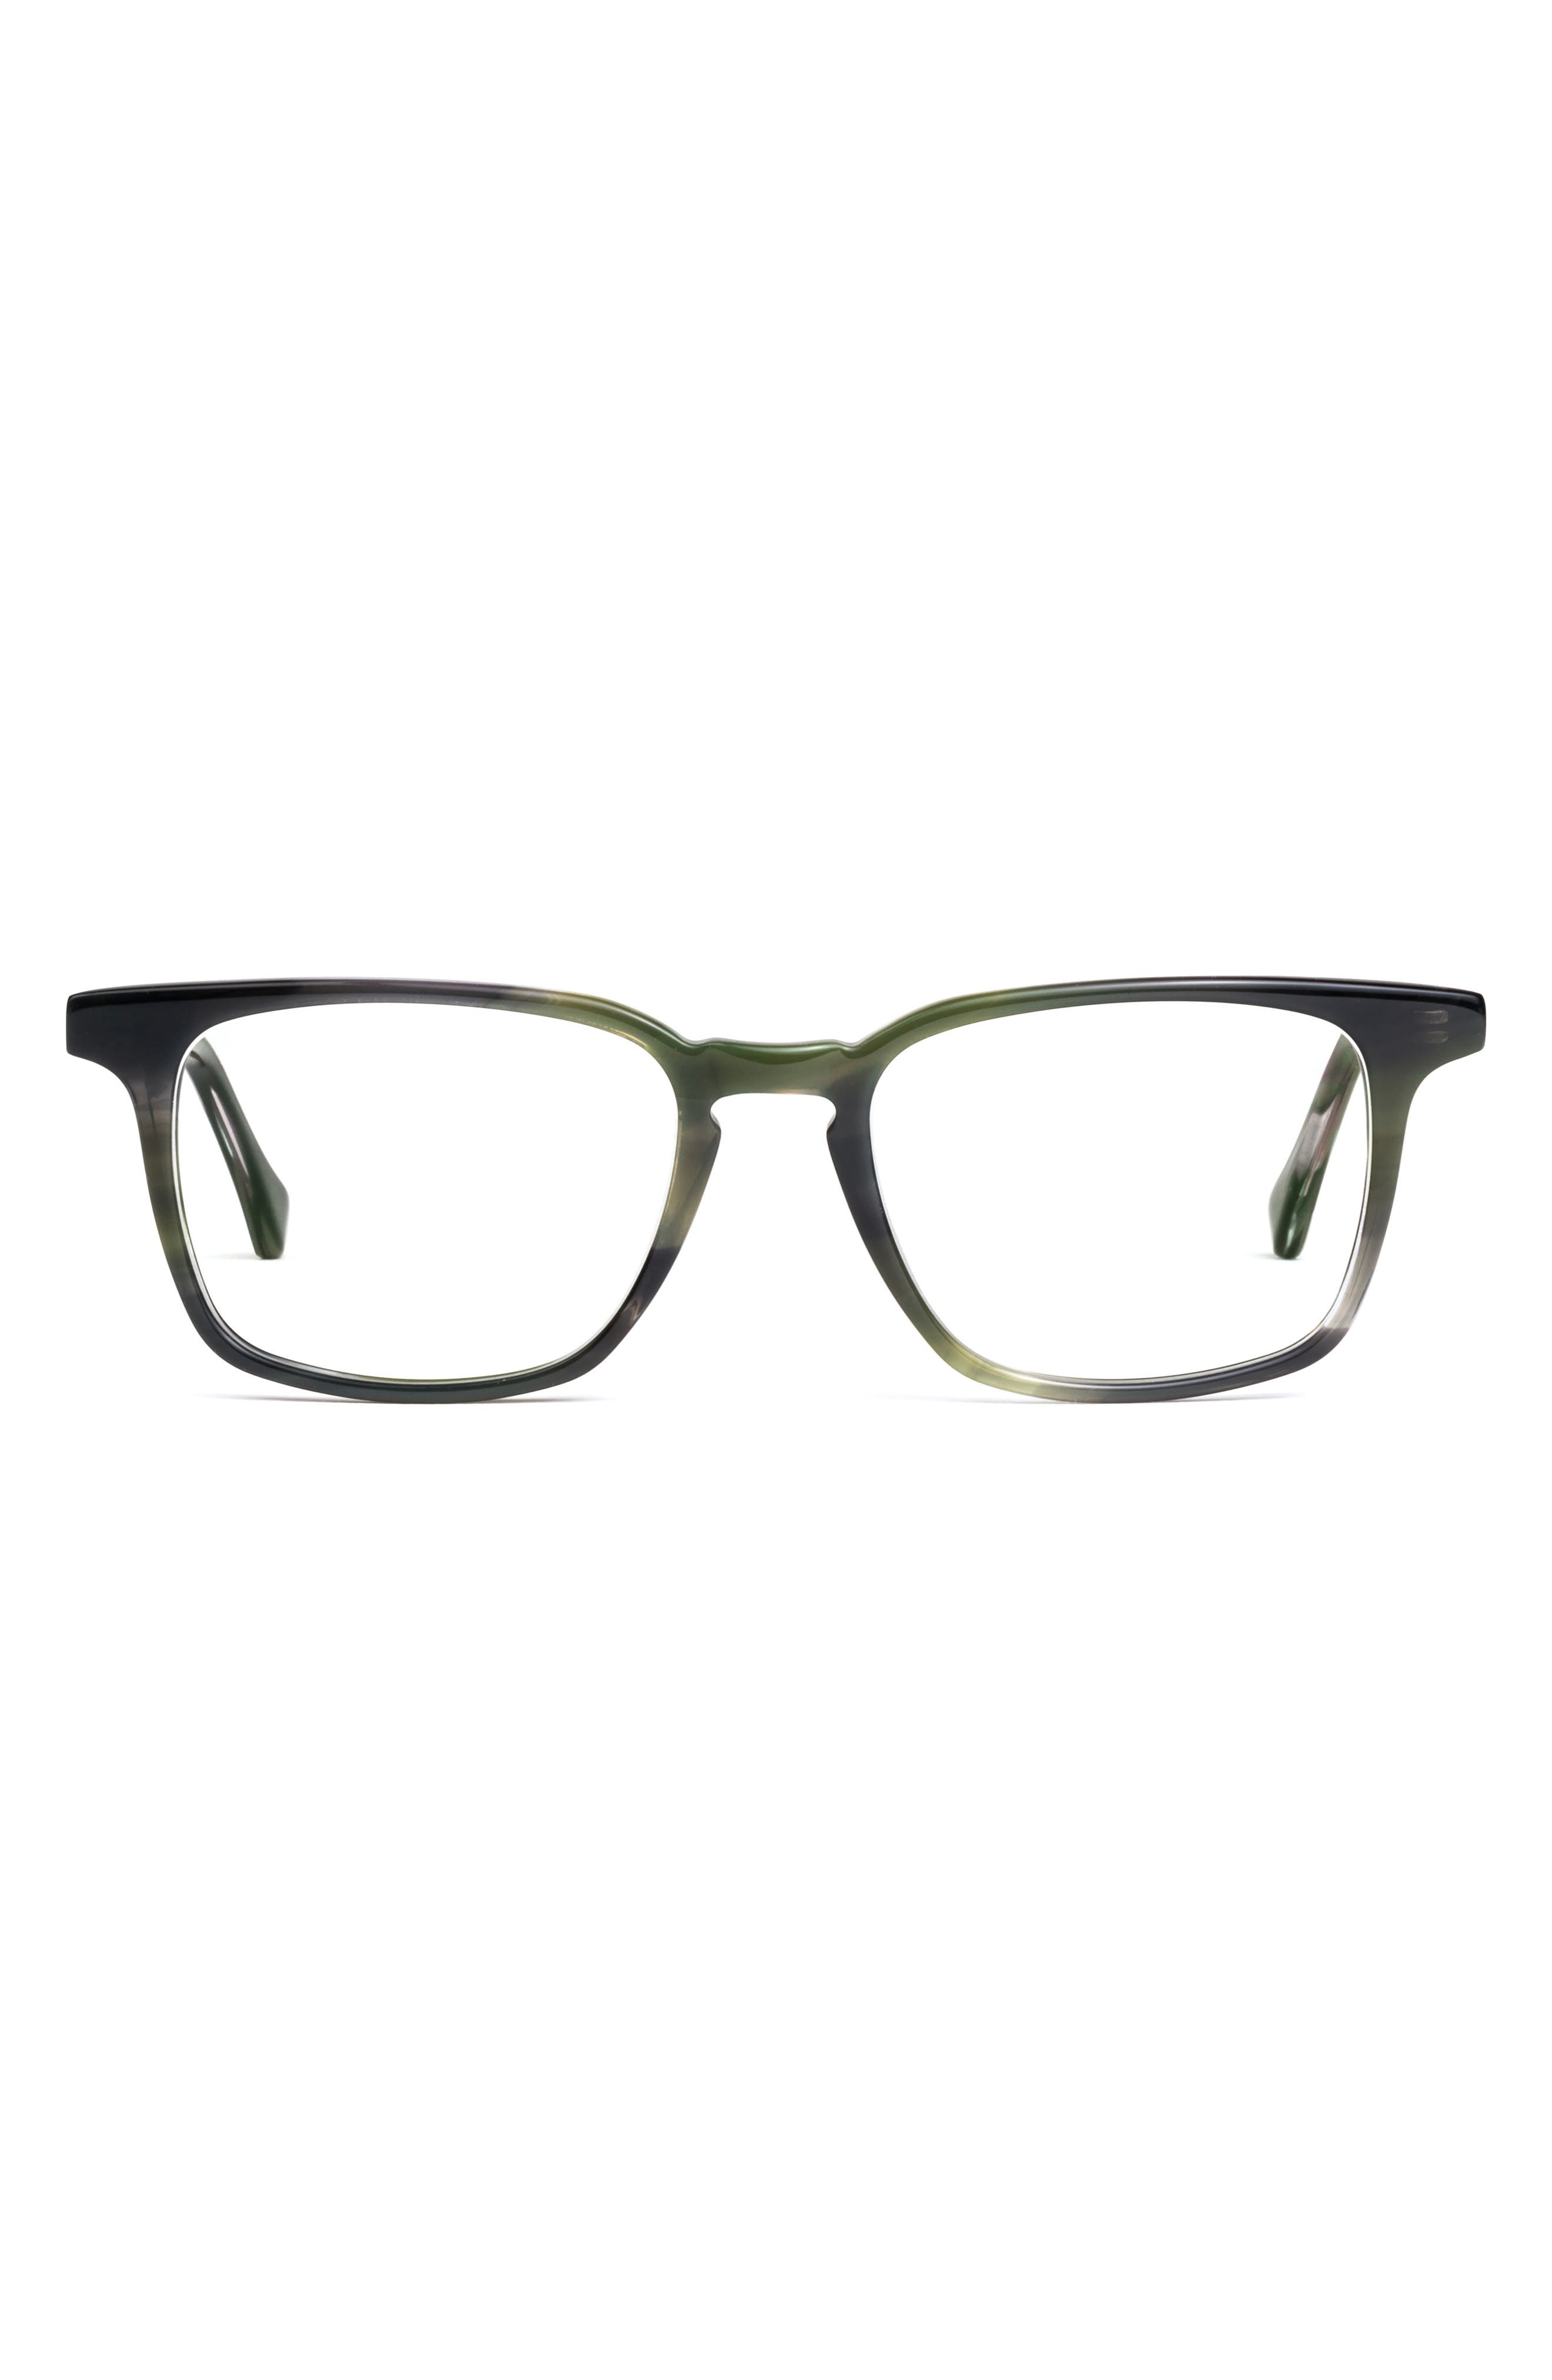 Nash 49mm Square Blue Light Blocking Glasses